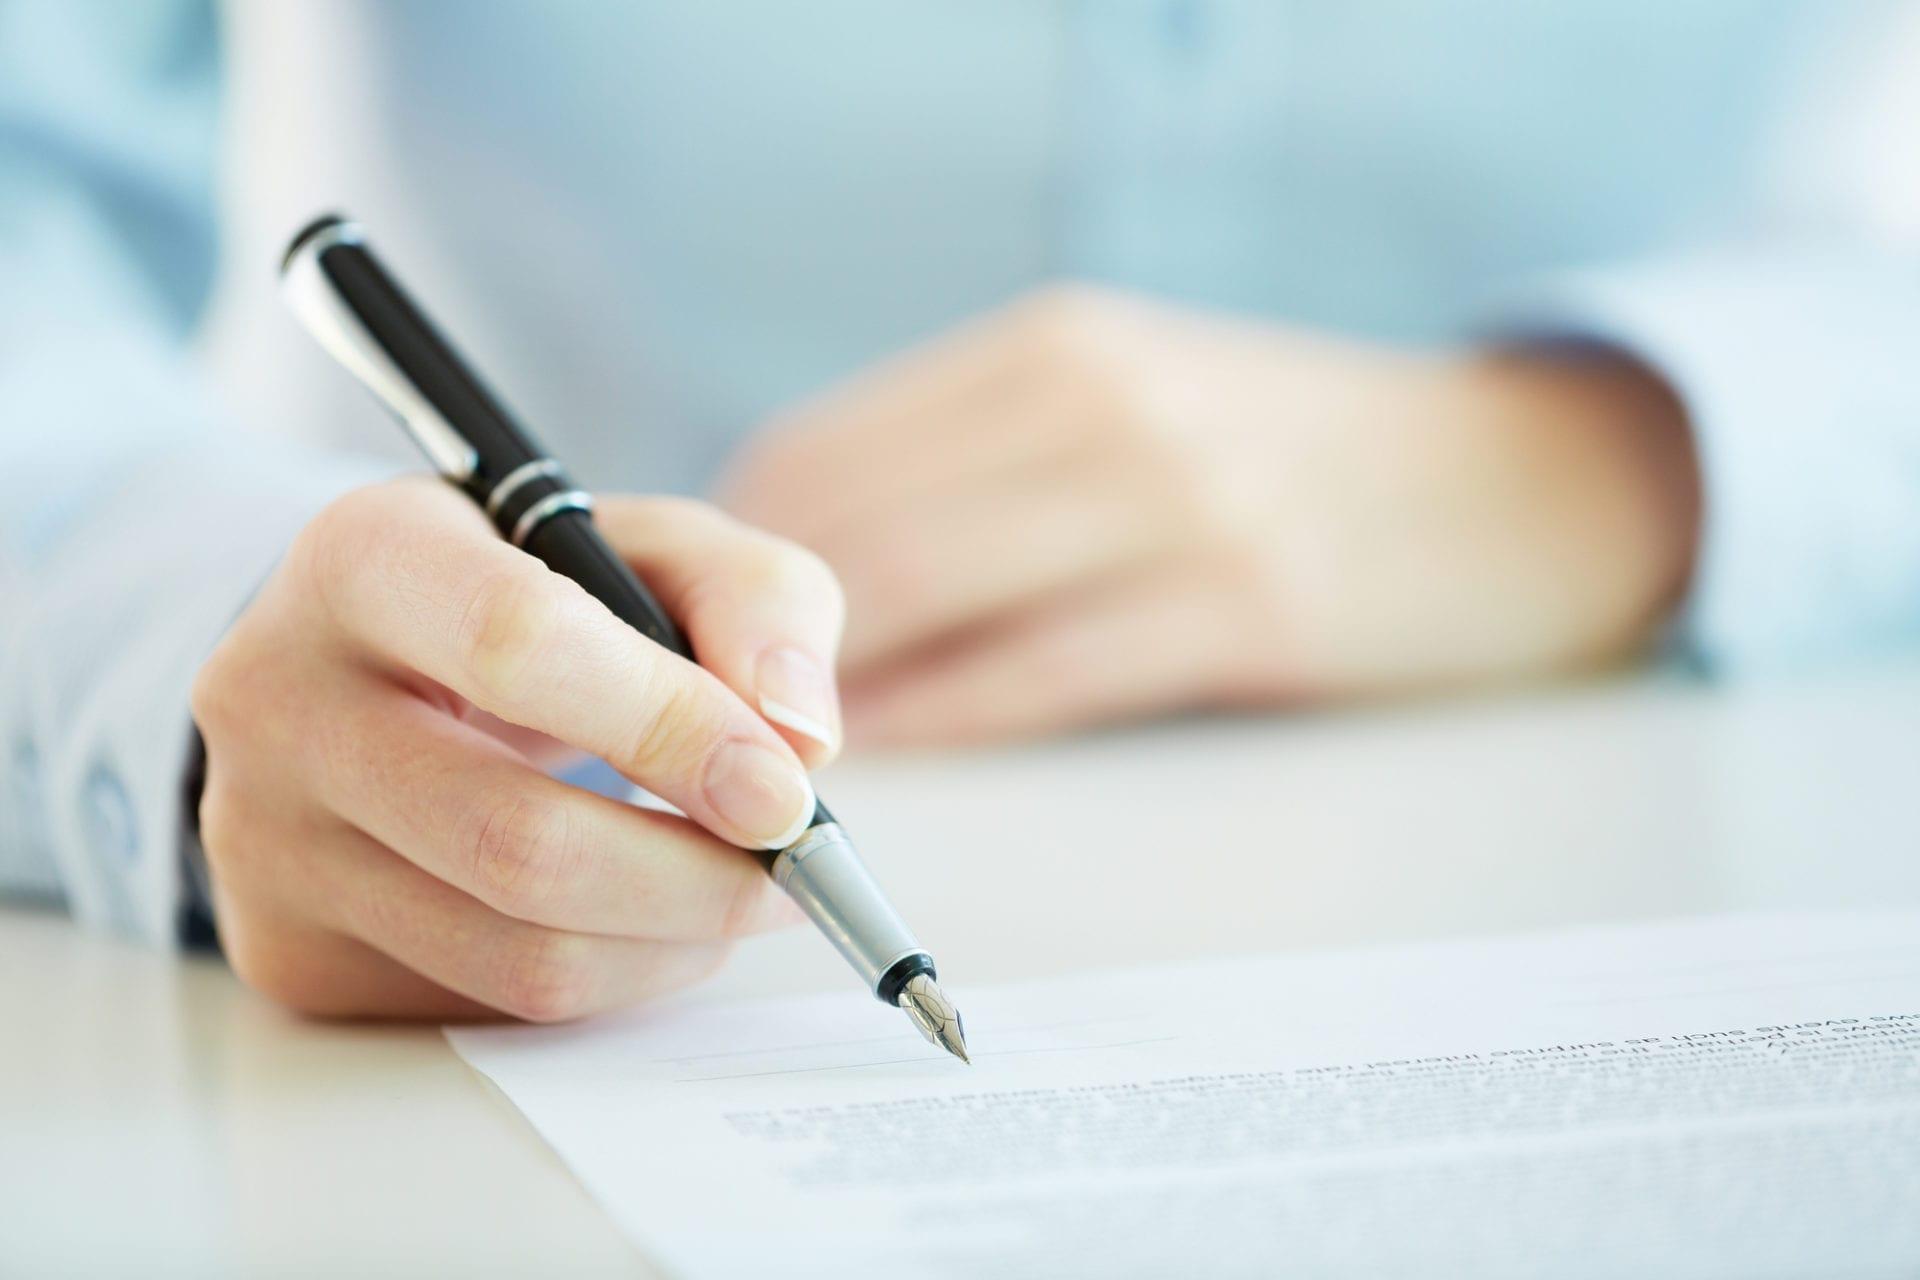 Graduate School Essay that Will Knock Their Socks Off